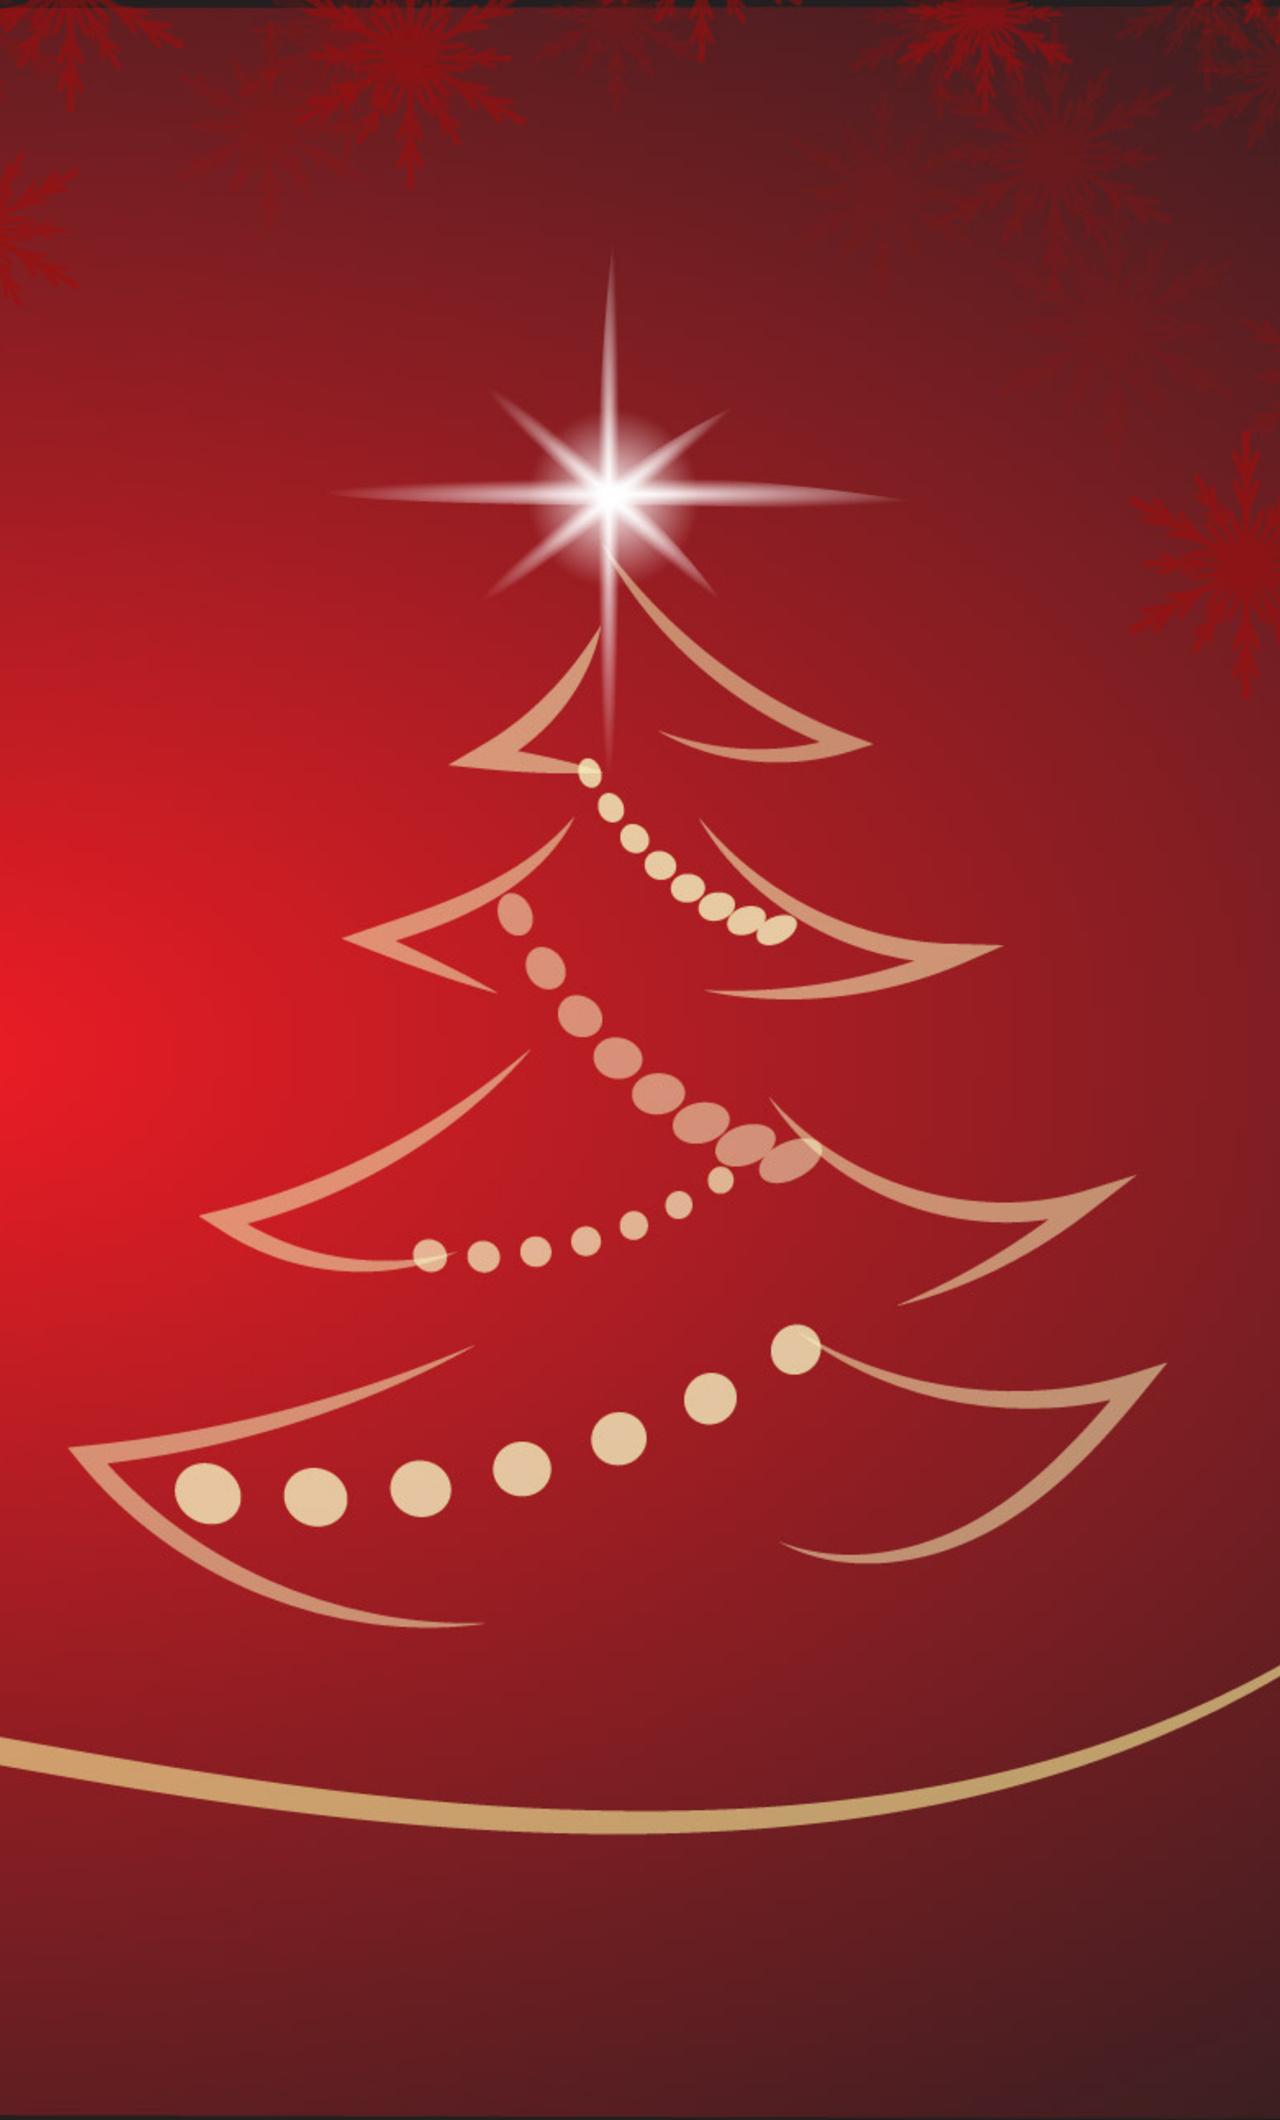 1280x2120 Christmas Tree Background iPhone 6+ HD 4k